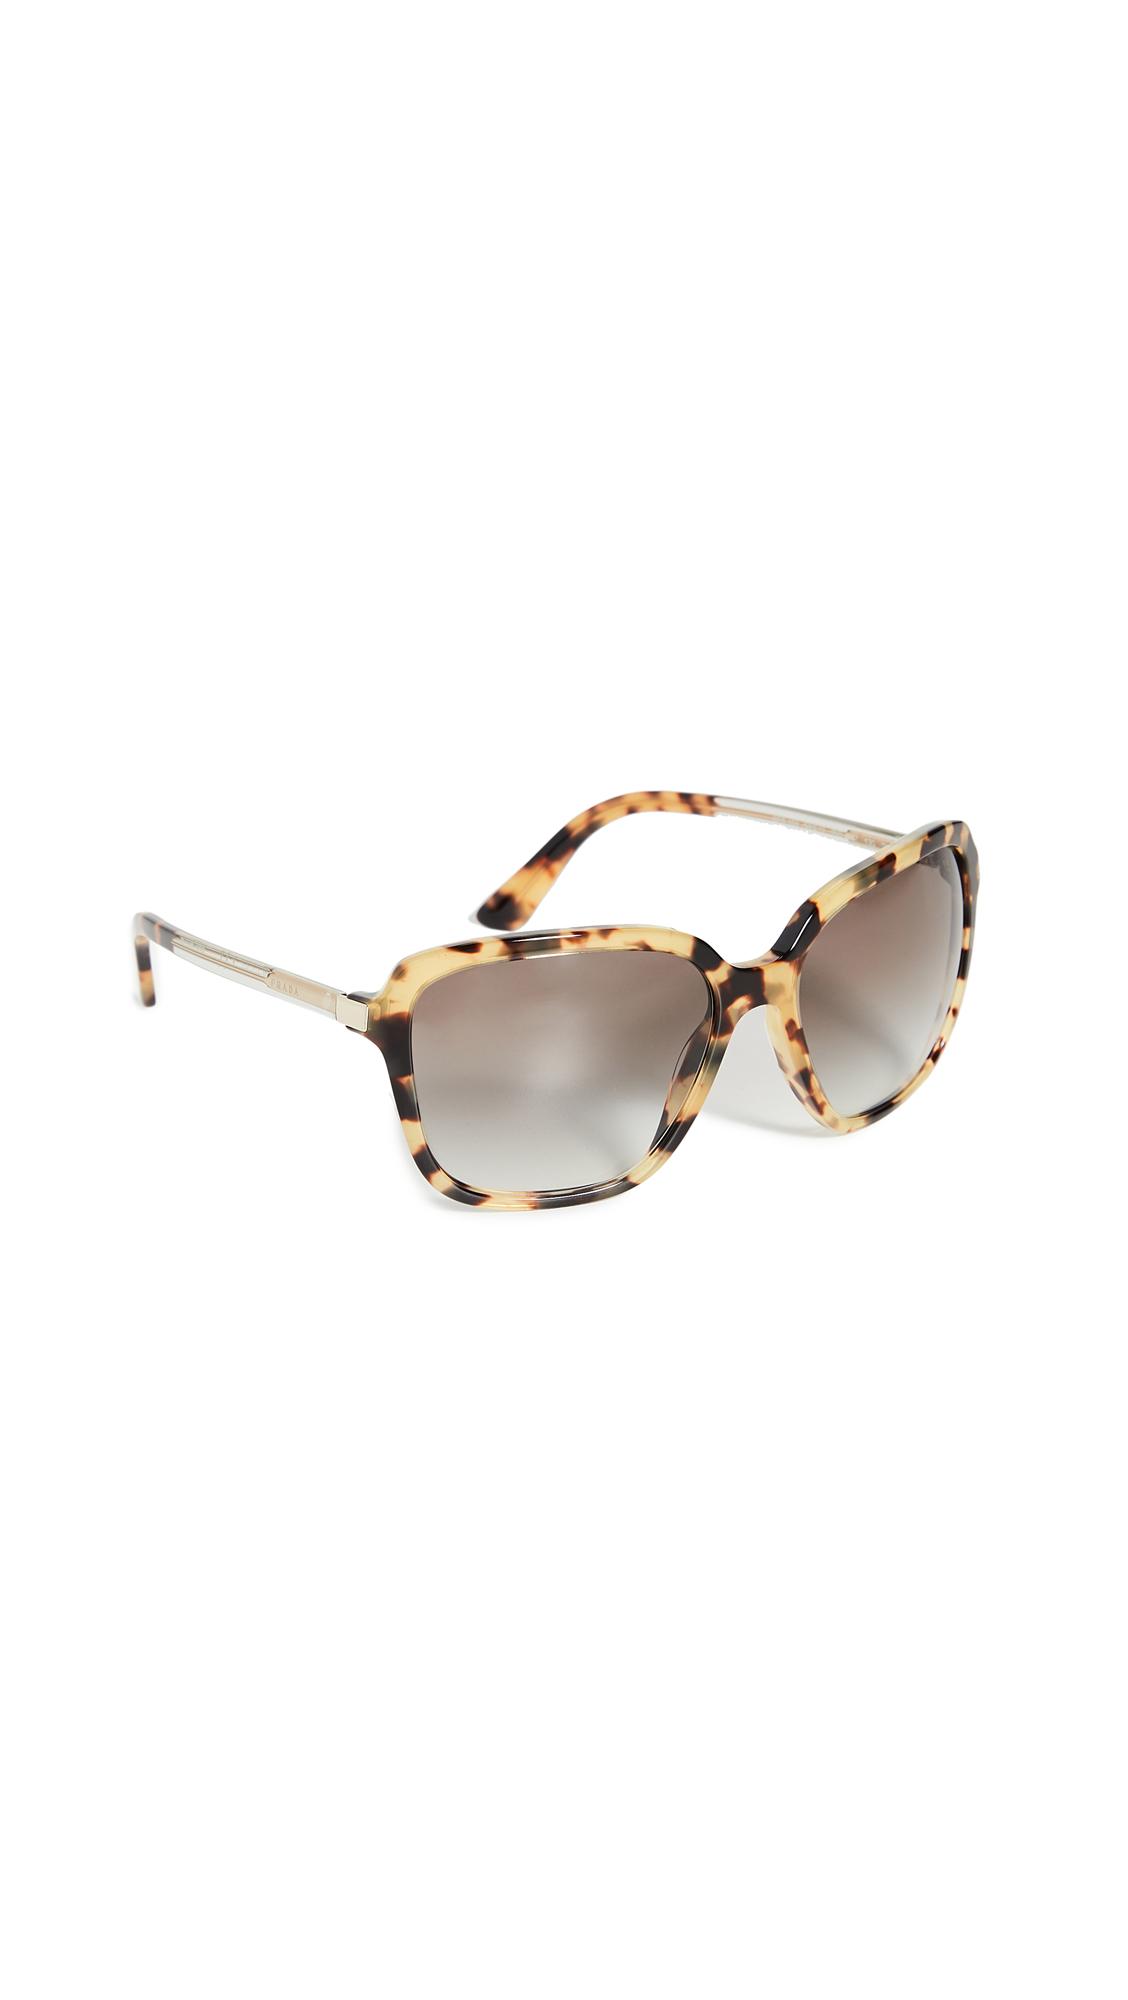 70dd9f3ed5aa Prada Oversized Square Sunglasses In Medium Havana | ModeSens